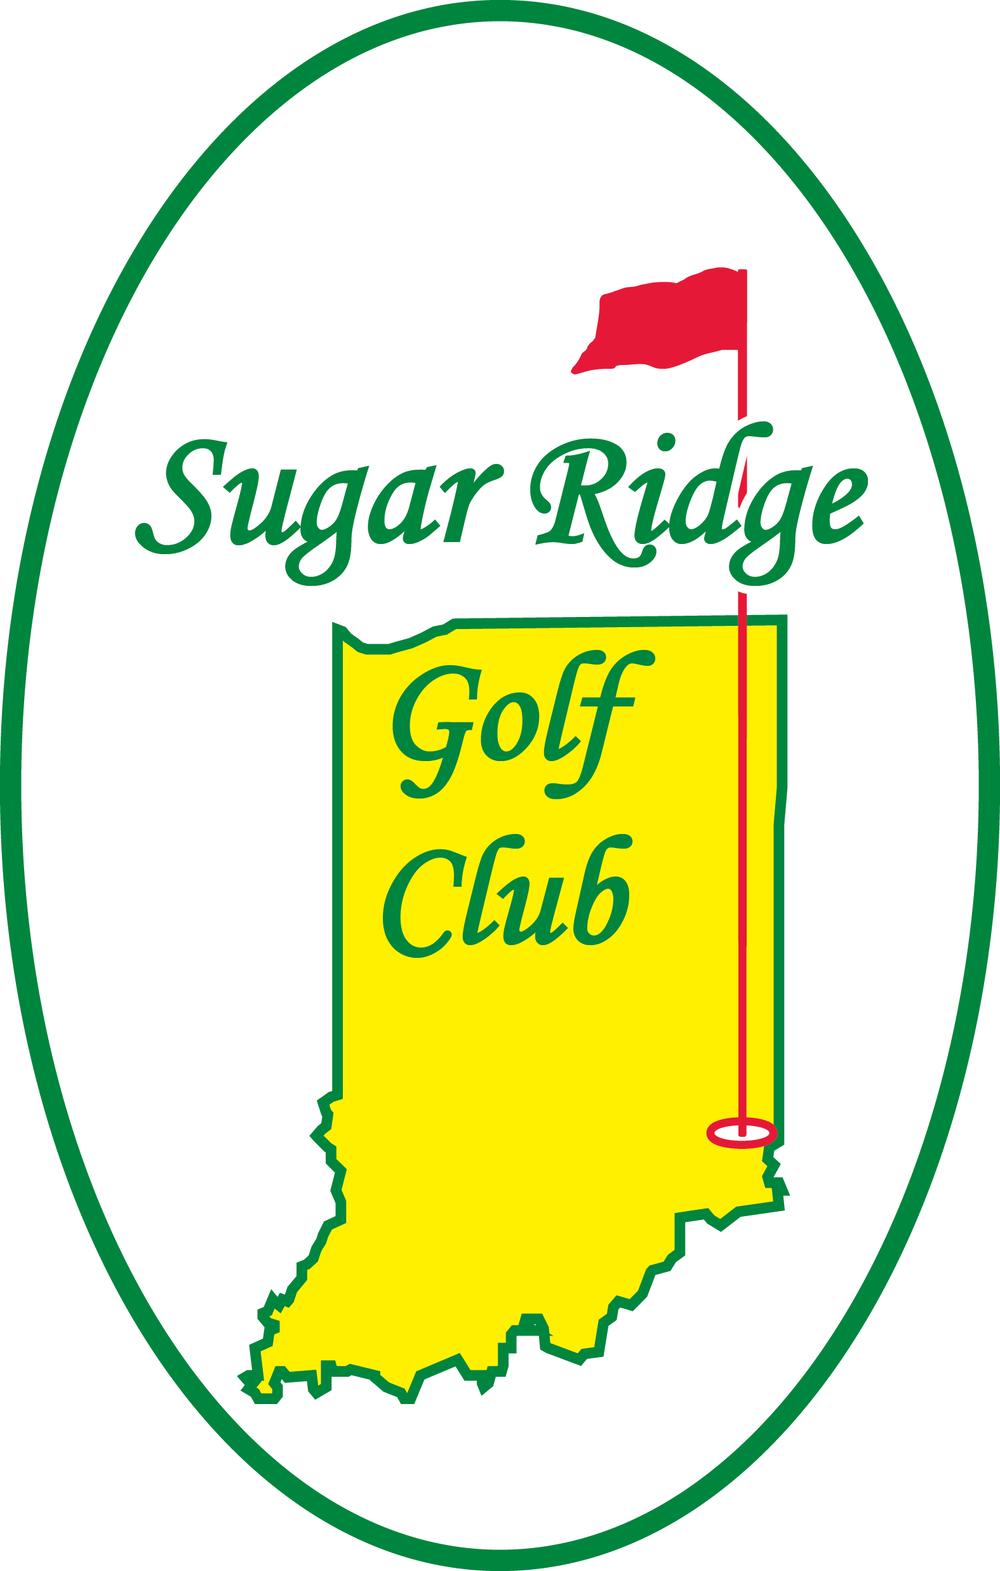 SugarRidgeGolfClubLogo-Option8 Round.png